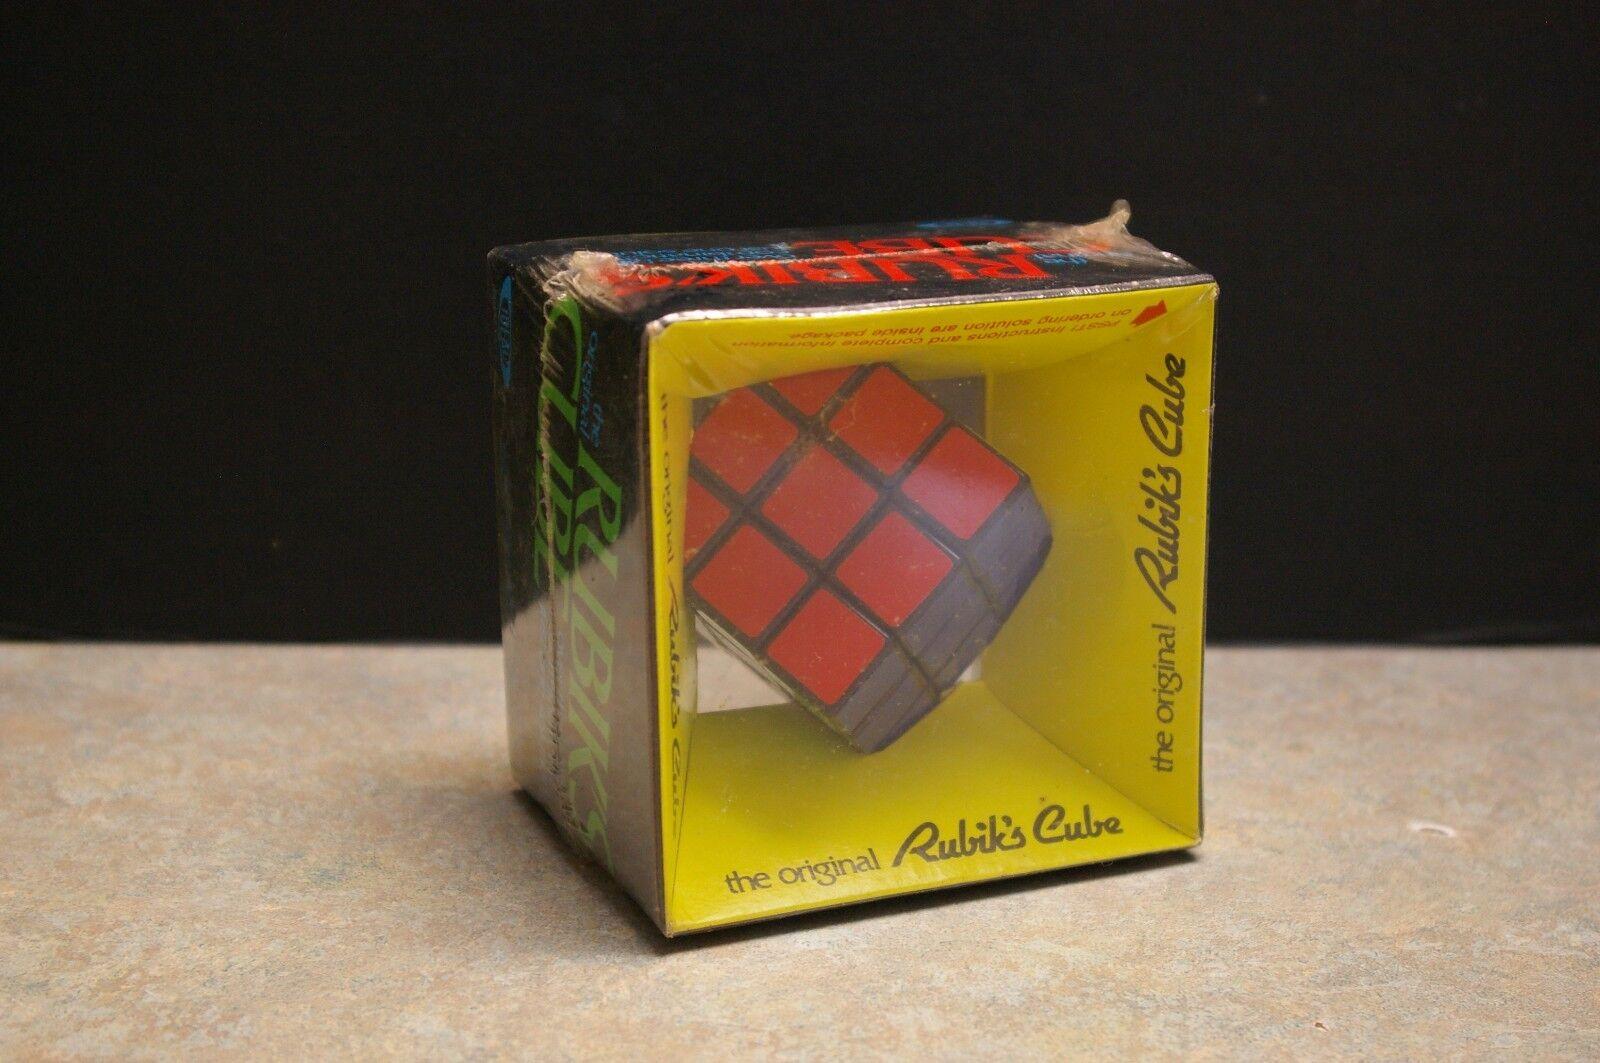 NEW ORIGINAL 1980'S 'IDEAL' 'RUBIK'S CUBE' FACTORY SEALED NO. 2164-2